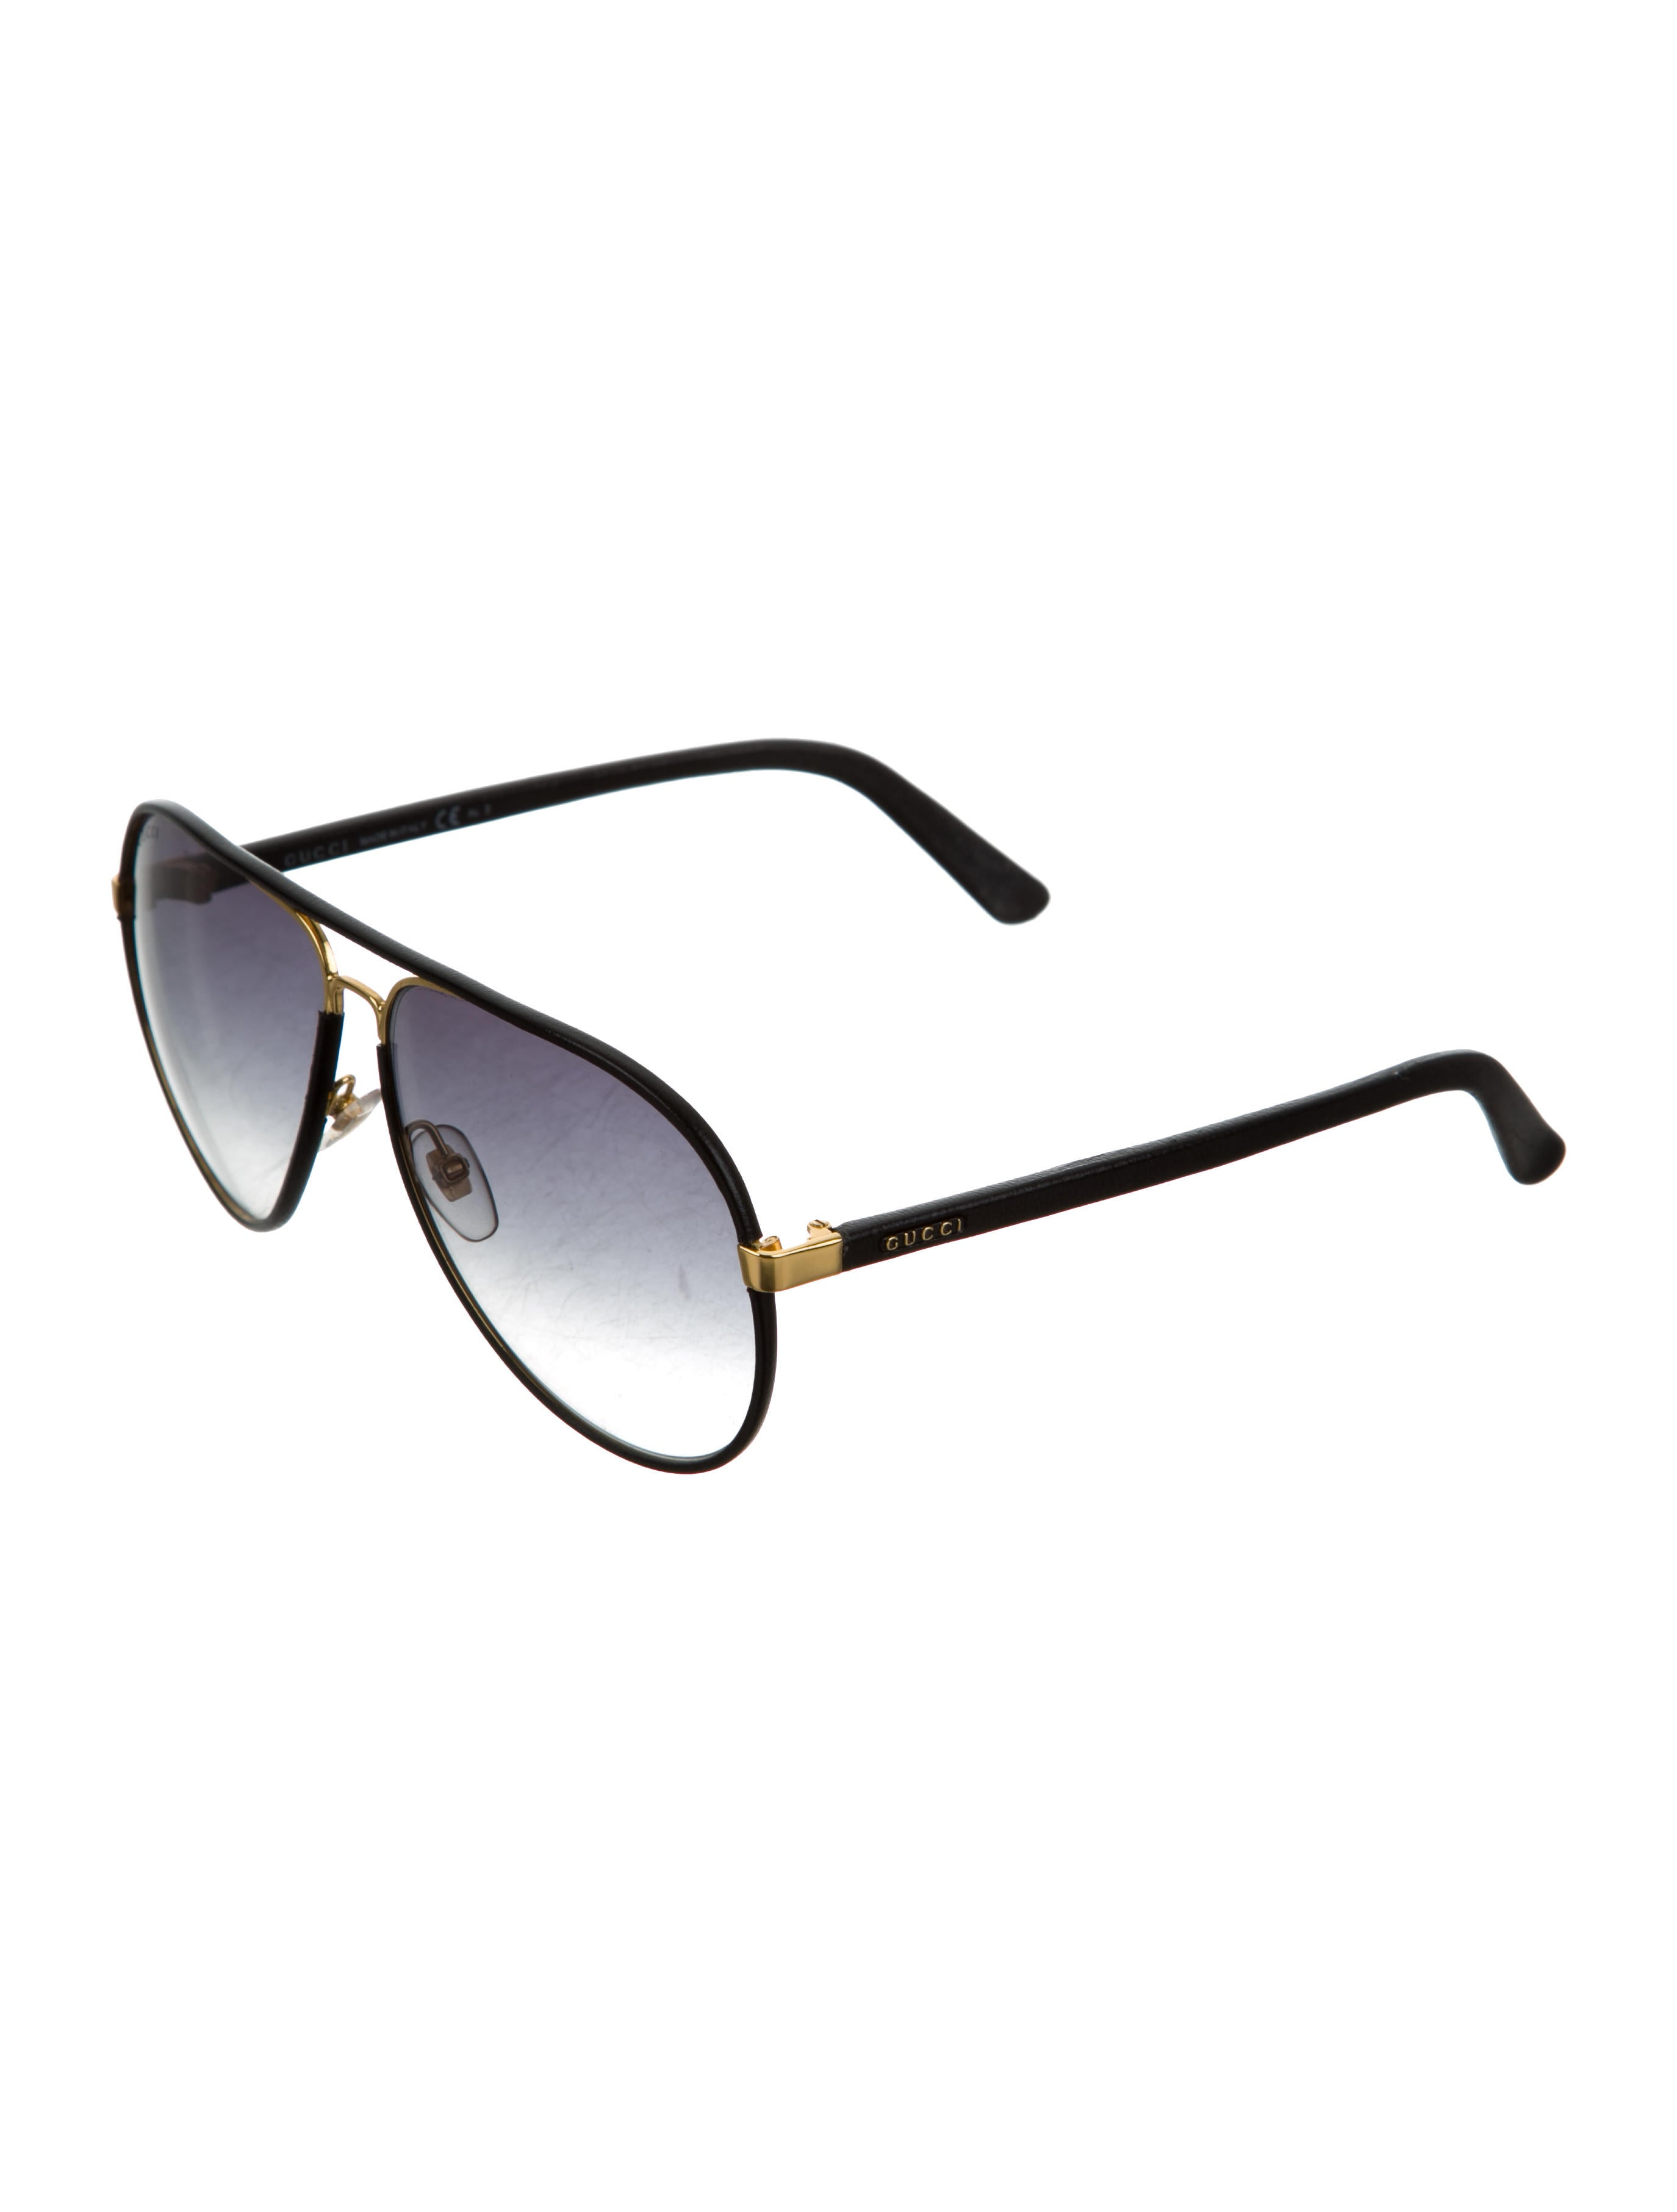 Gucci Sunglasses Leather Frame Aviator : Gucci Logo Aviator Sunglasses - Accessories - GUC135086 ...